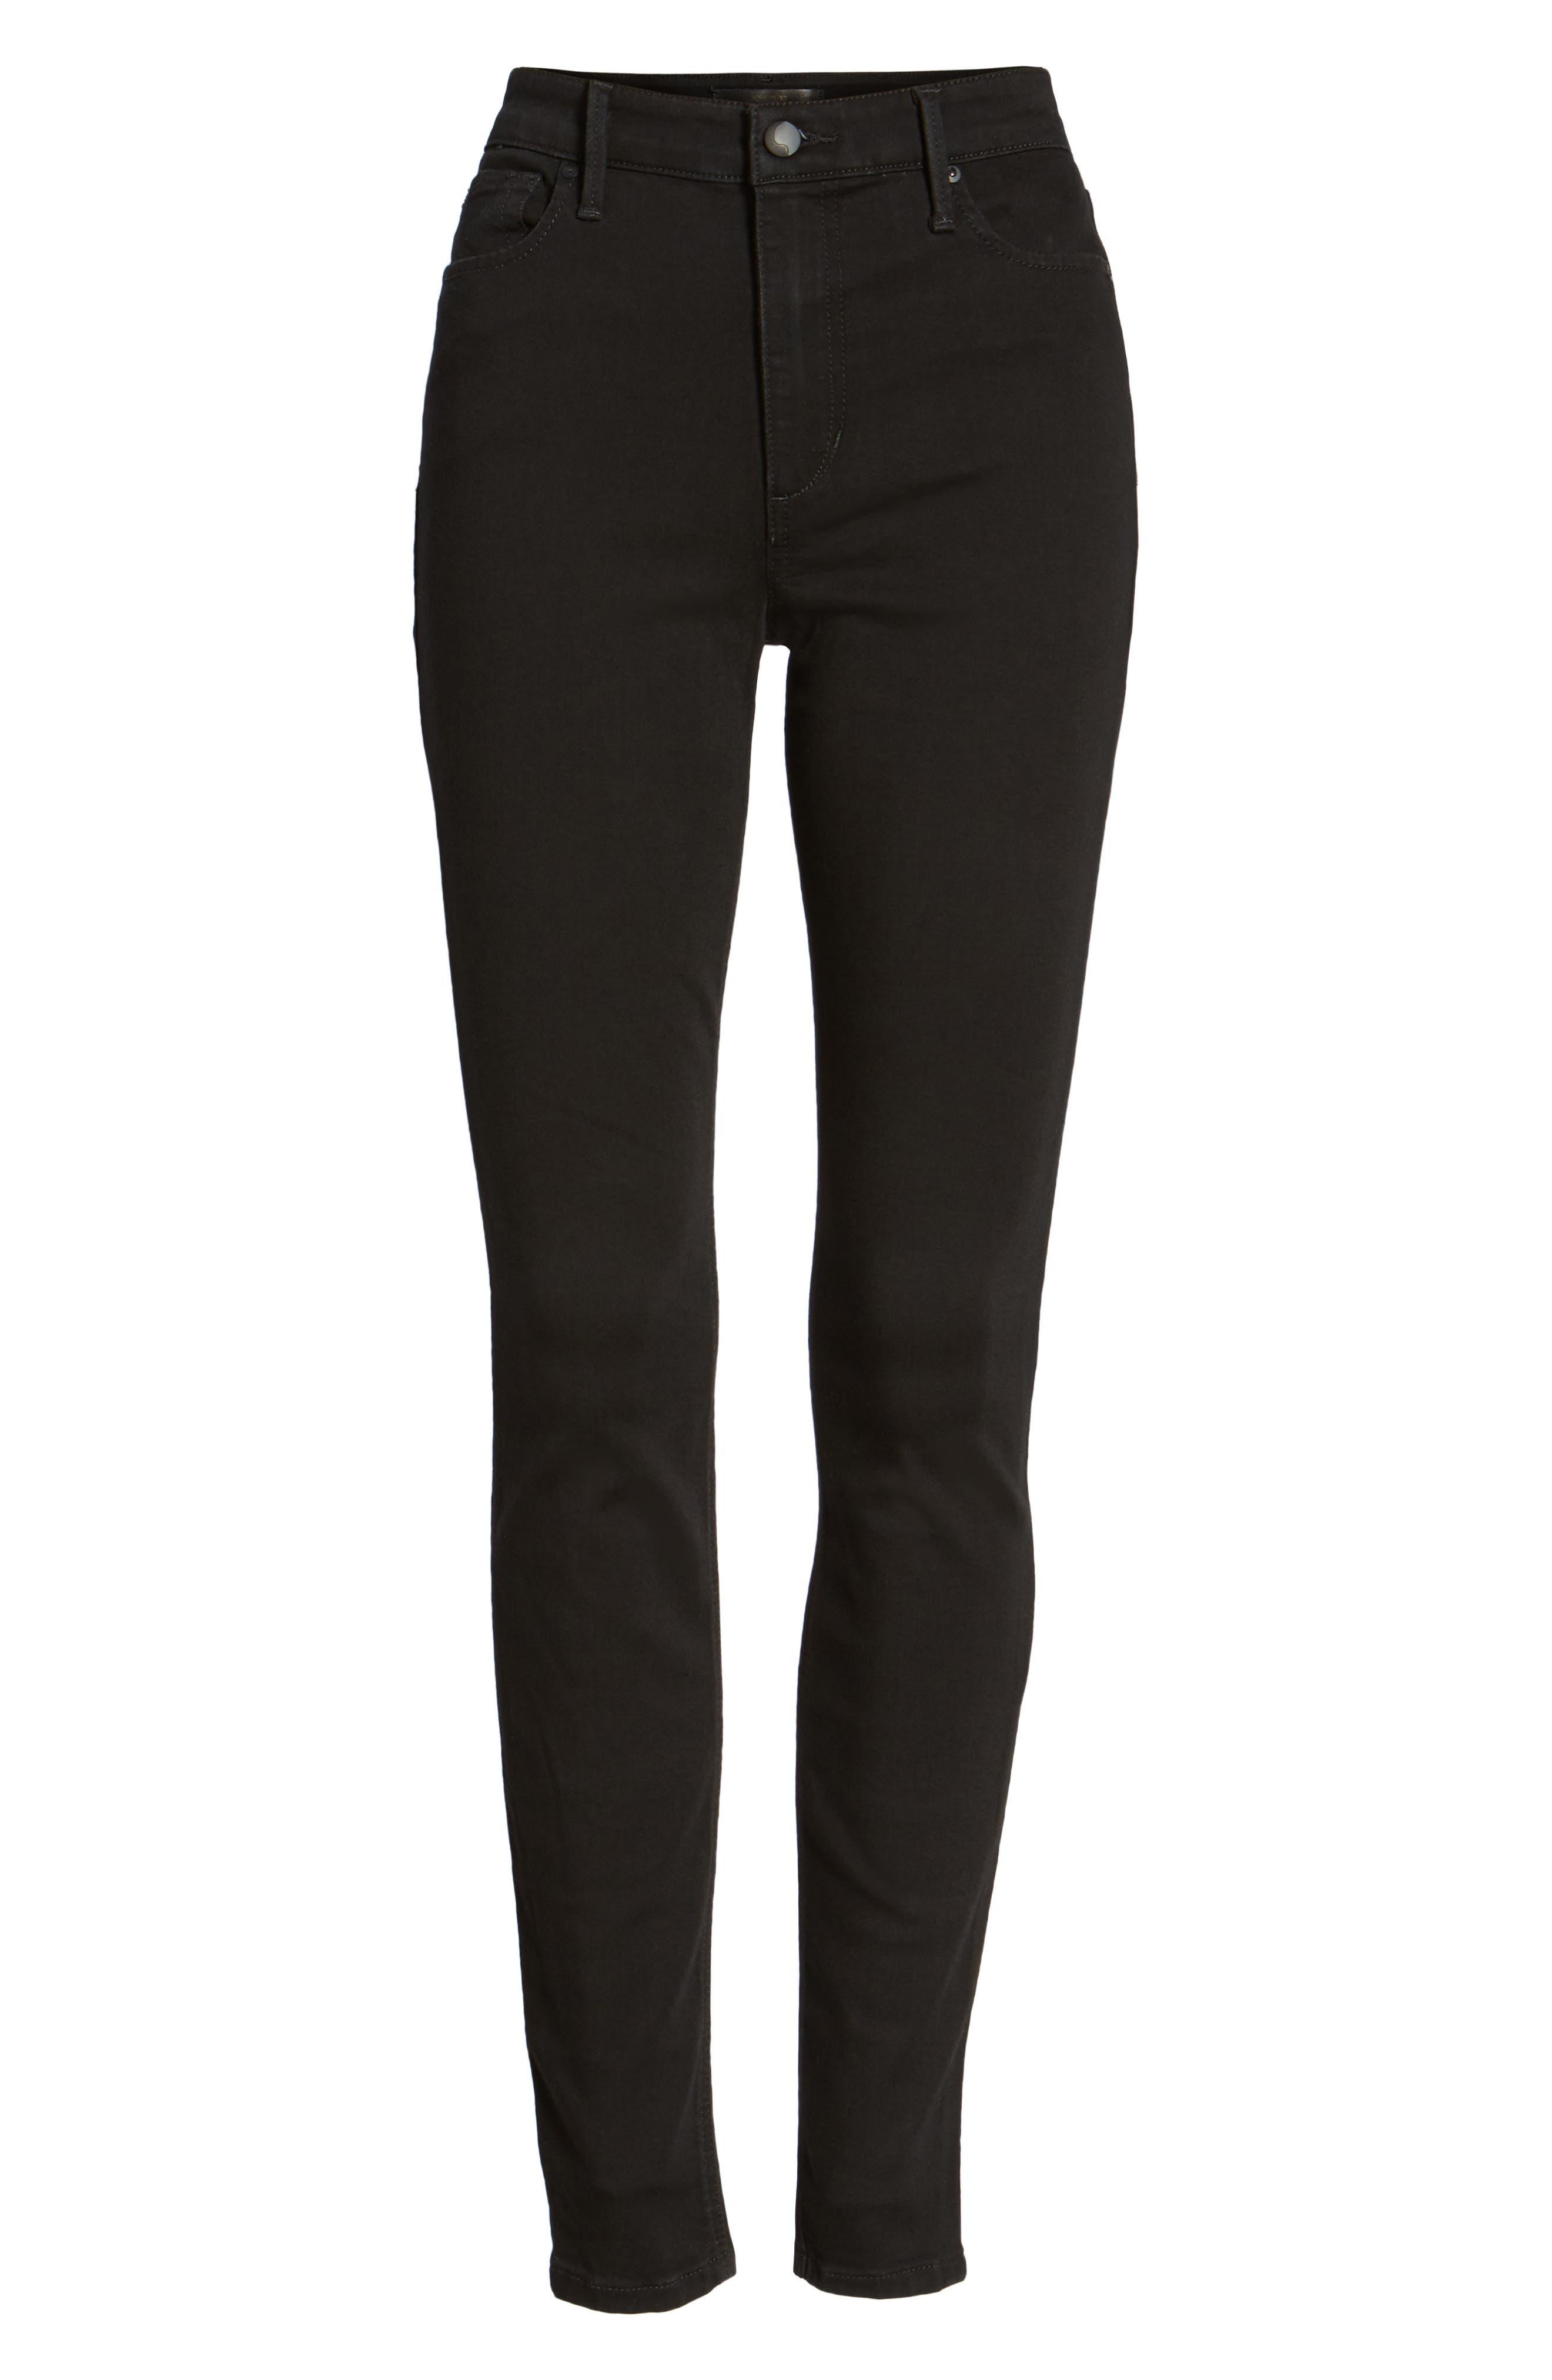 JOE'S 'Flawless - Charlie' Skinny Jeans, Main, color, REGAN